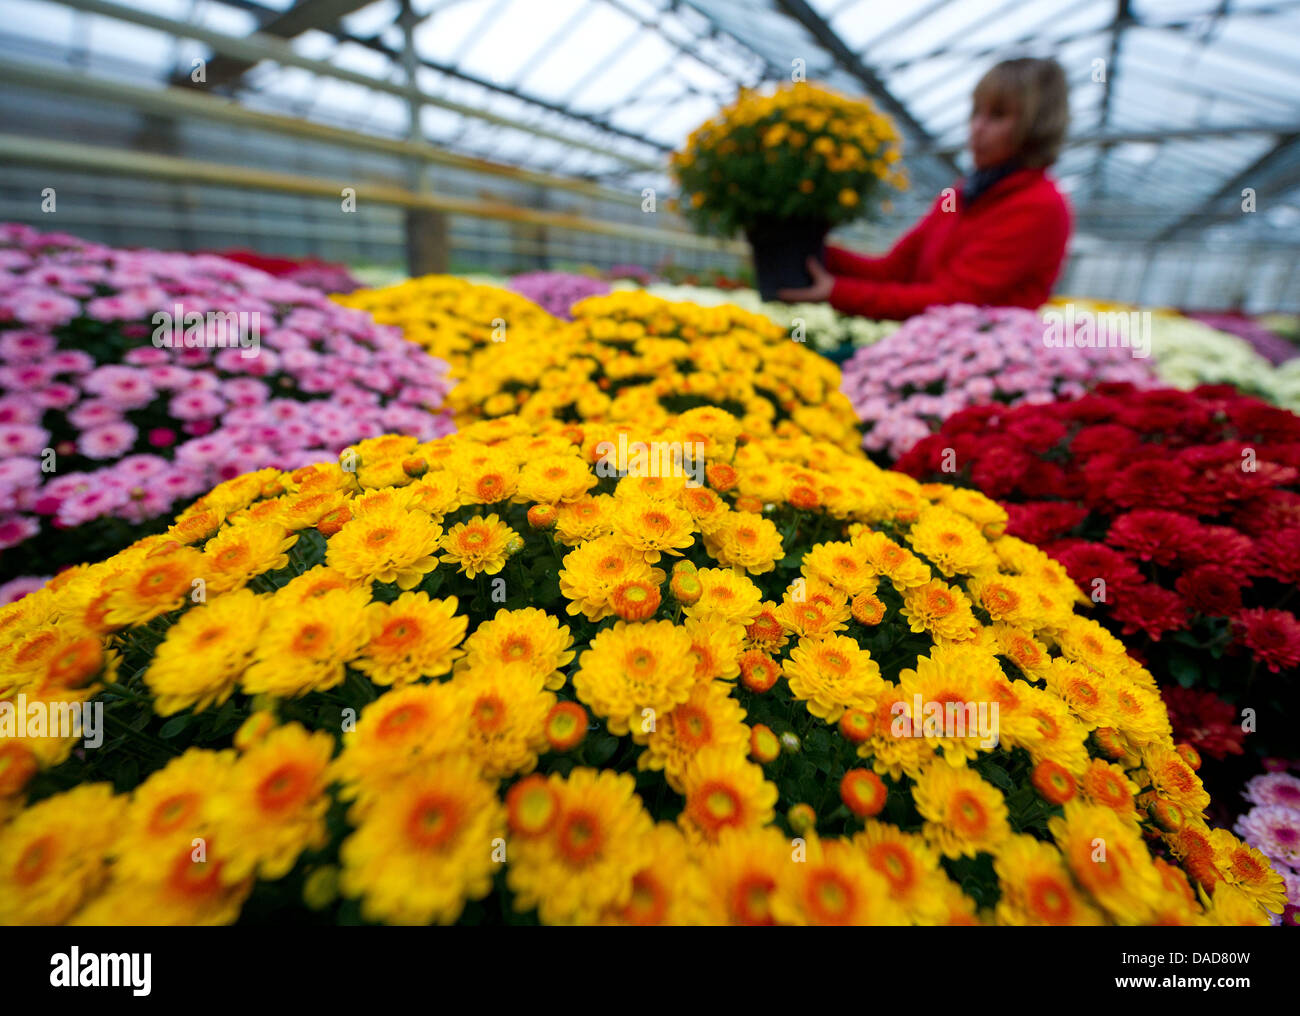 Floraland arnold